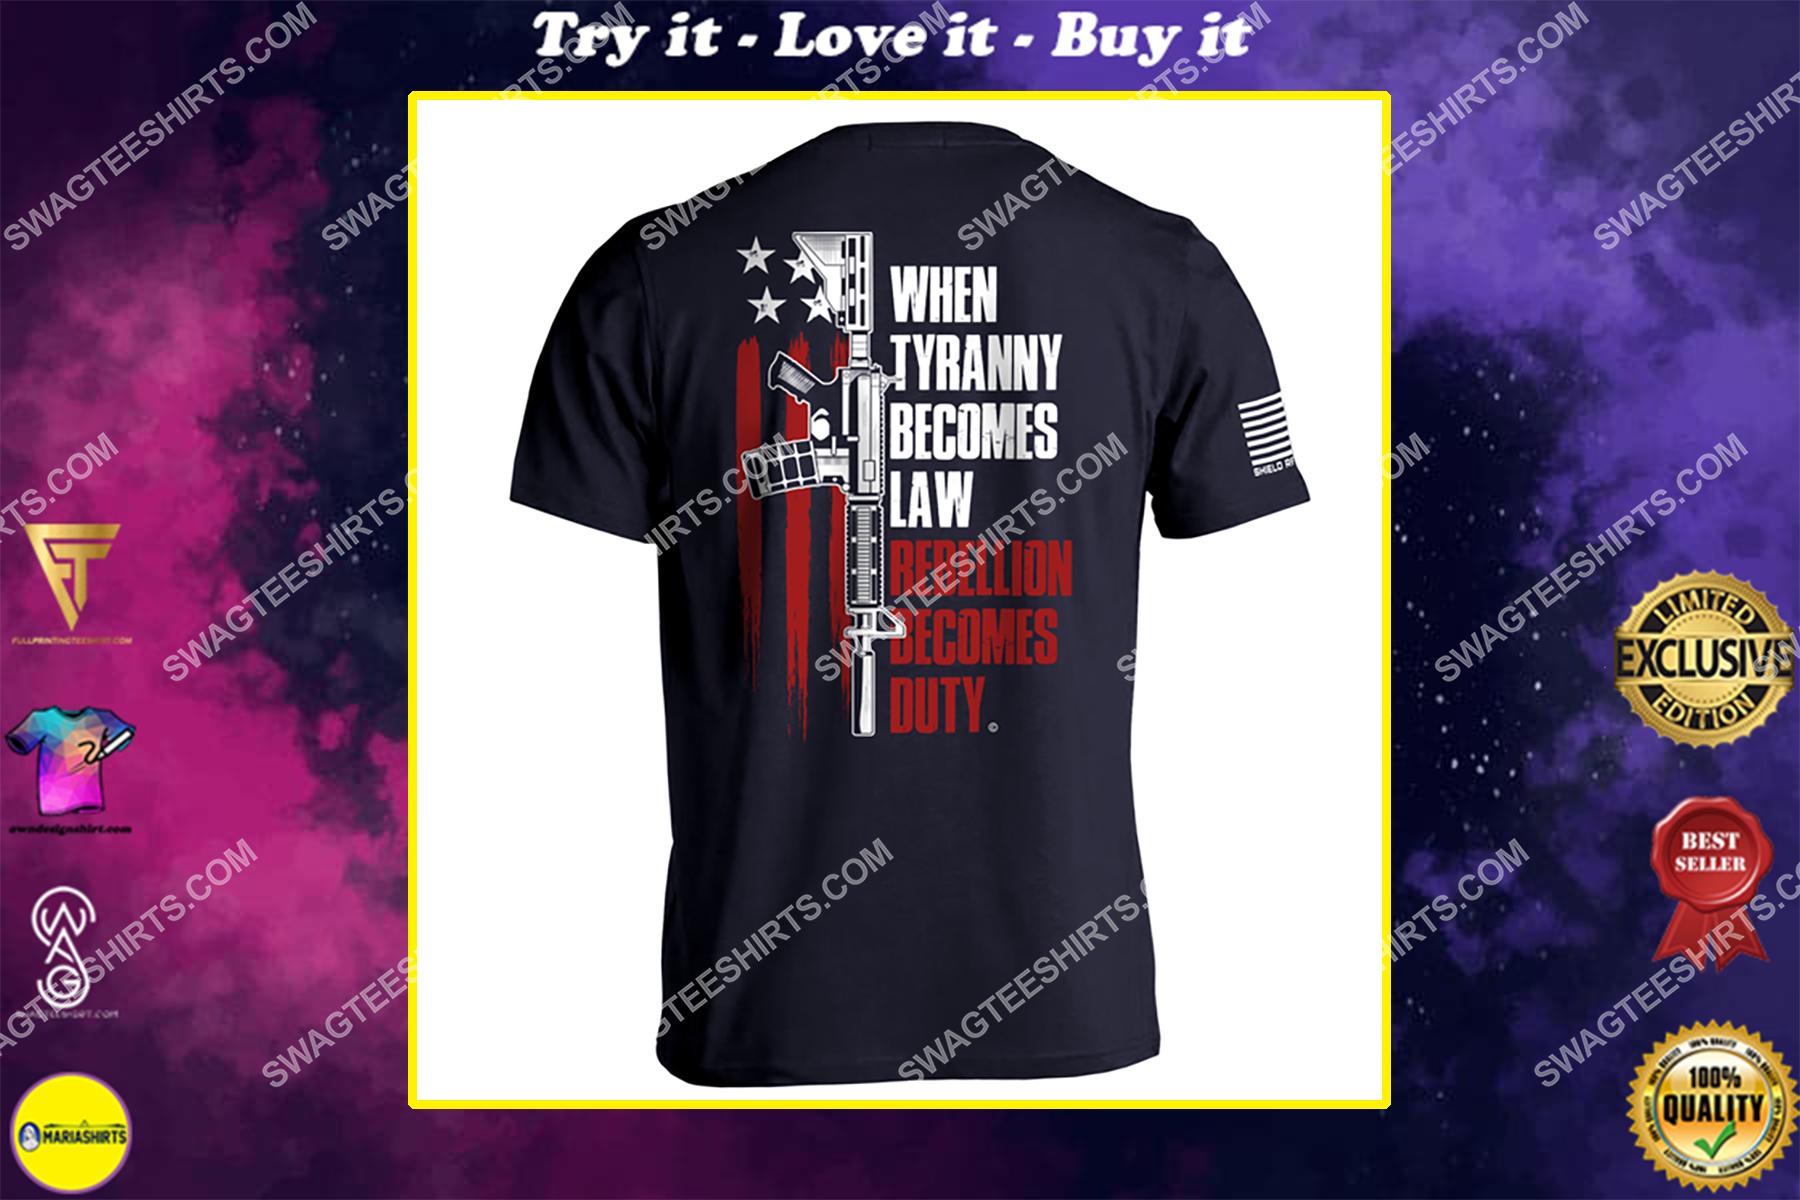 when tyranny becomes law rebellion becomes duty gun control shirt